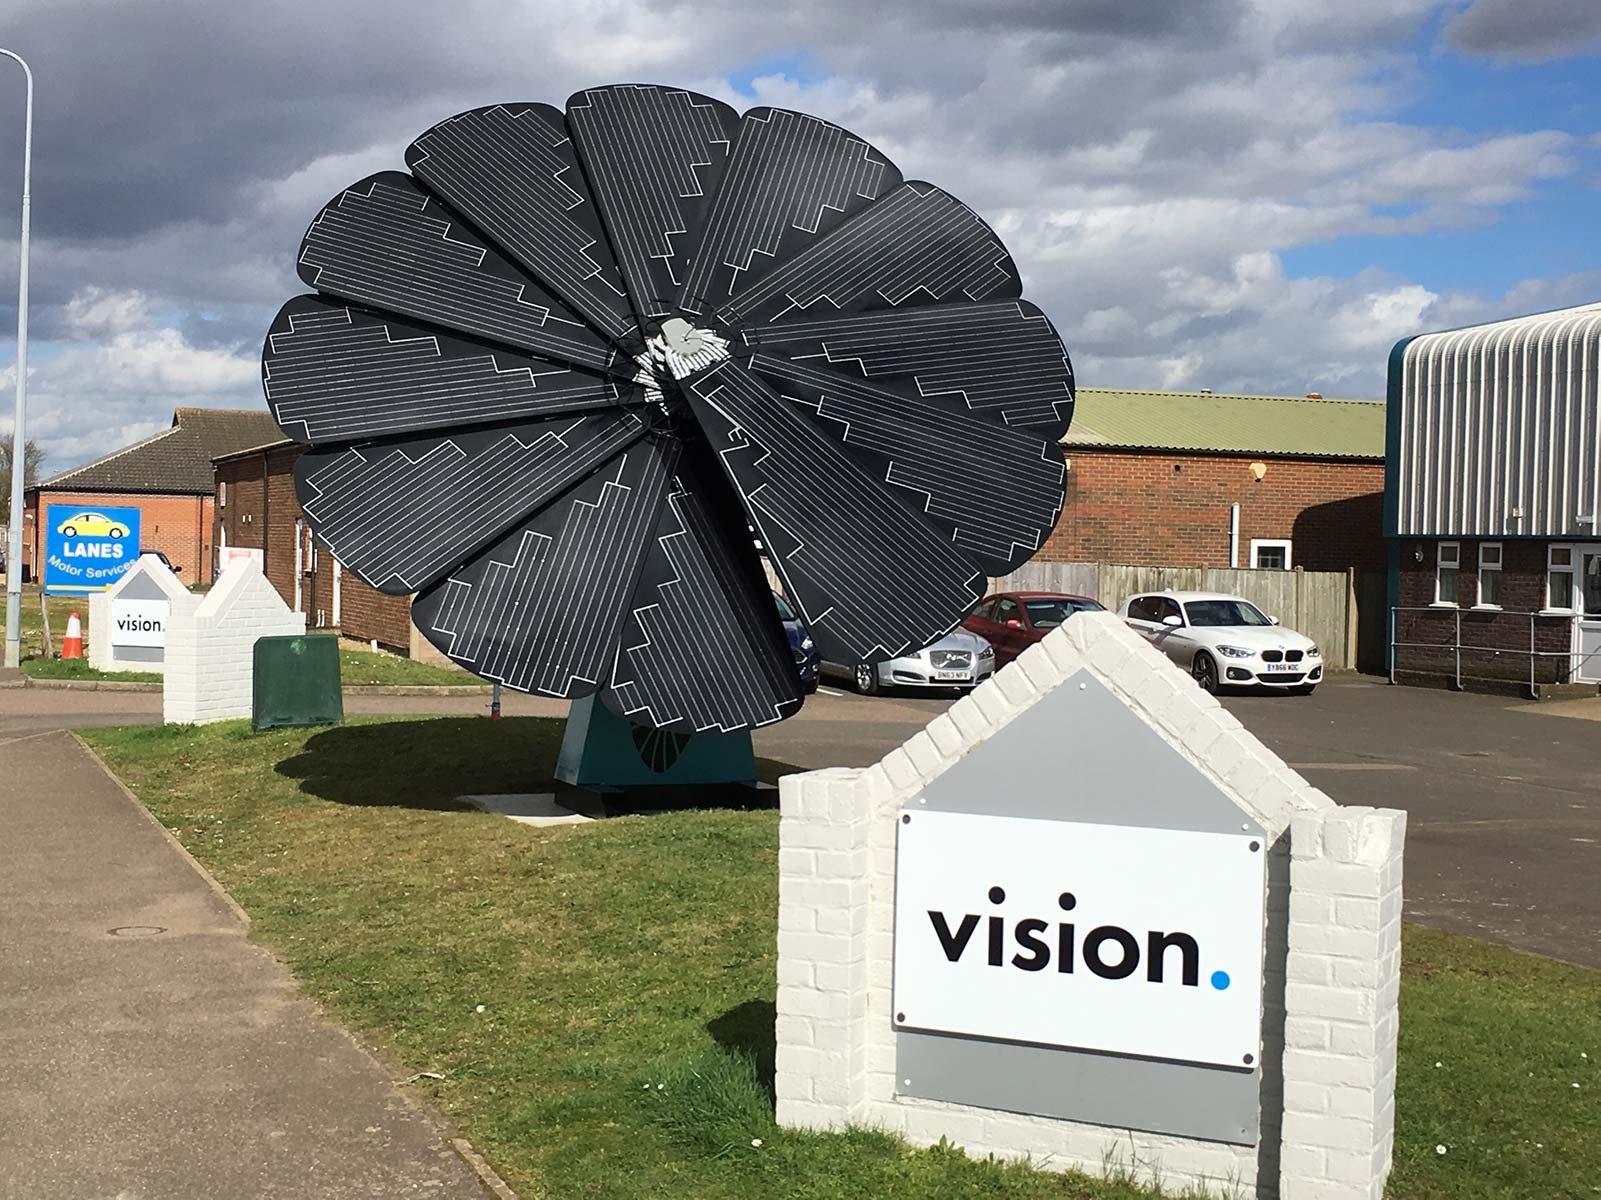 Vision signage